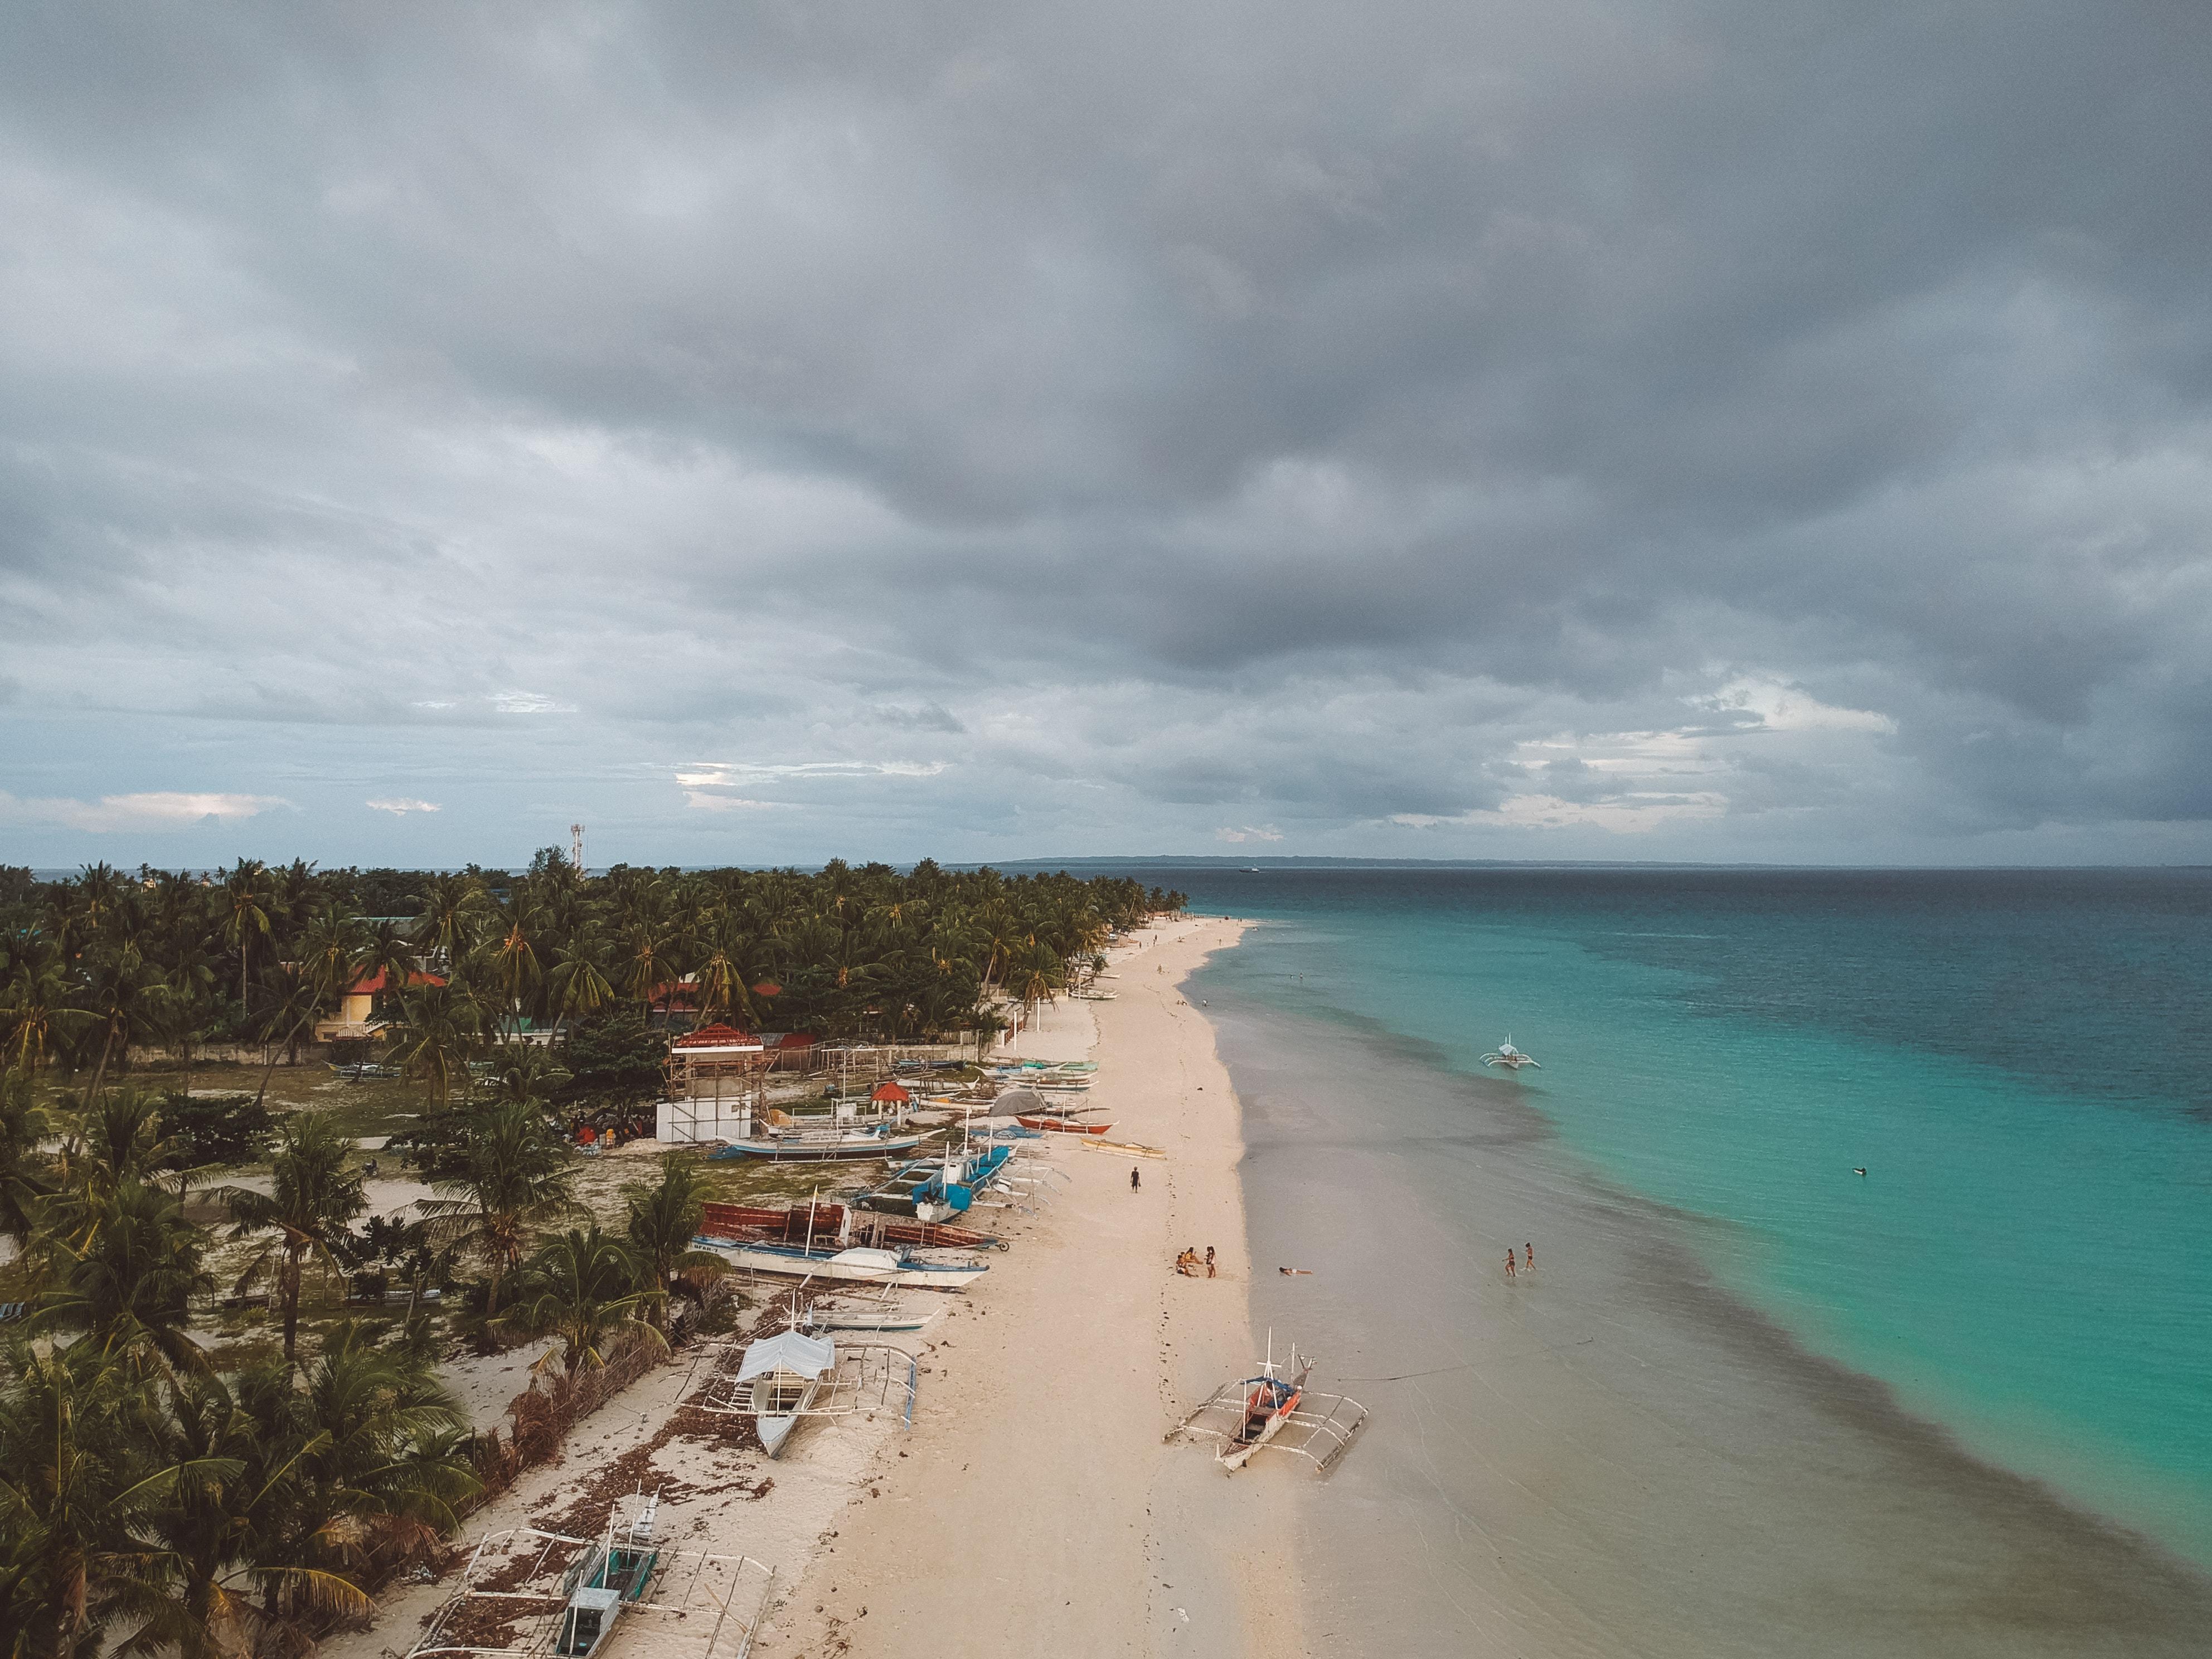 north cebu beaches, Kota Beach, beaches in Cebu,